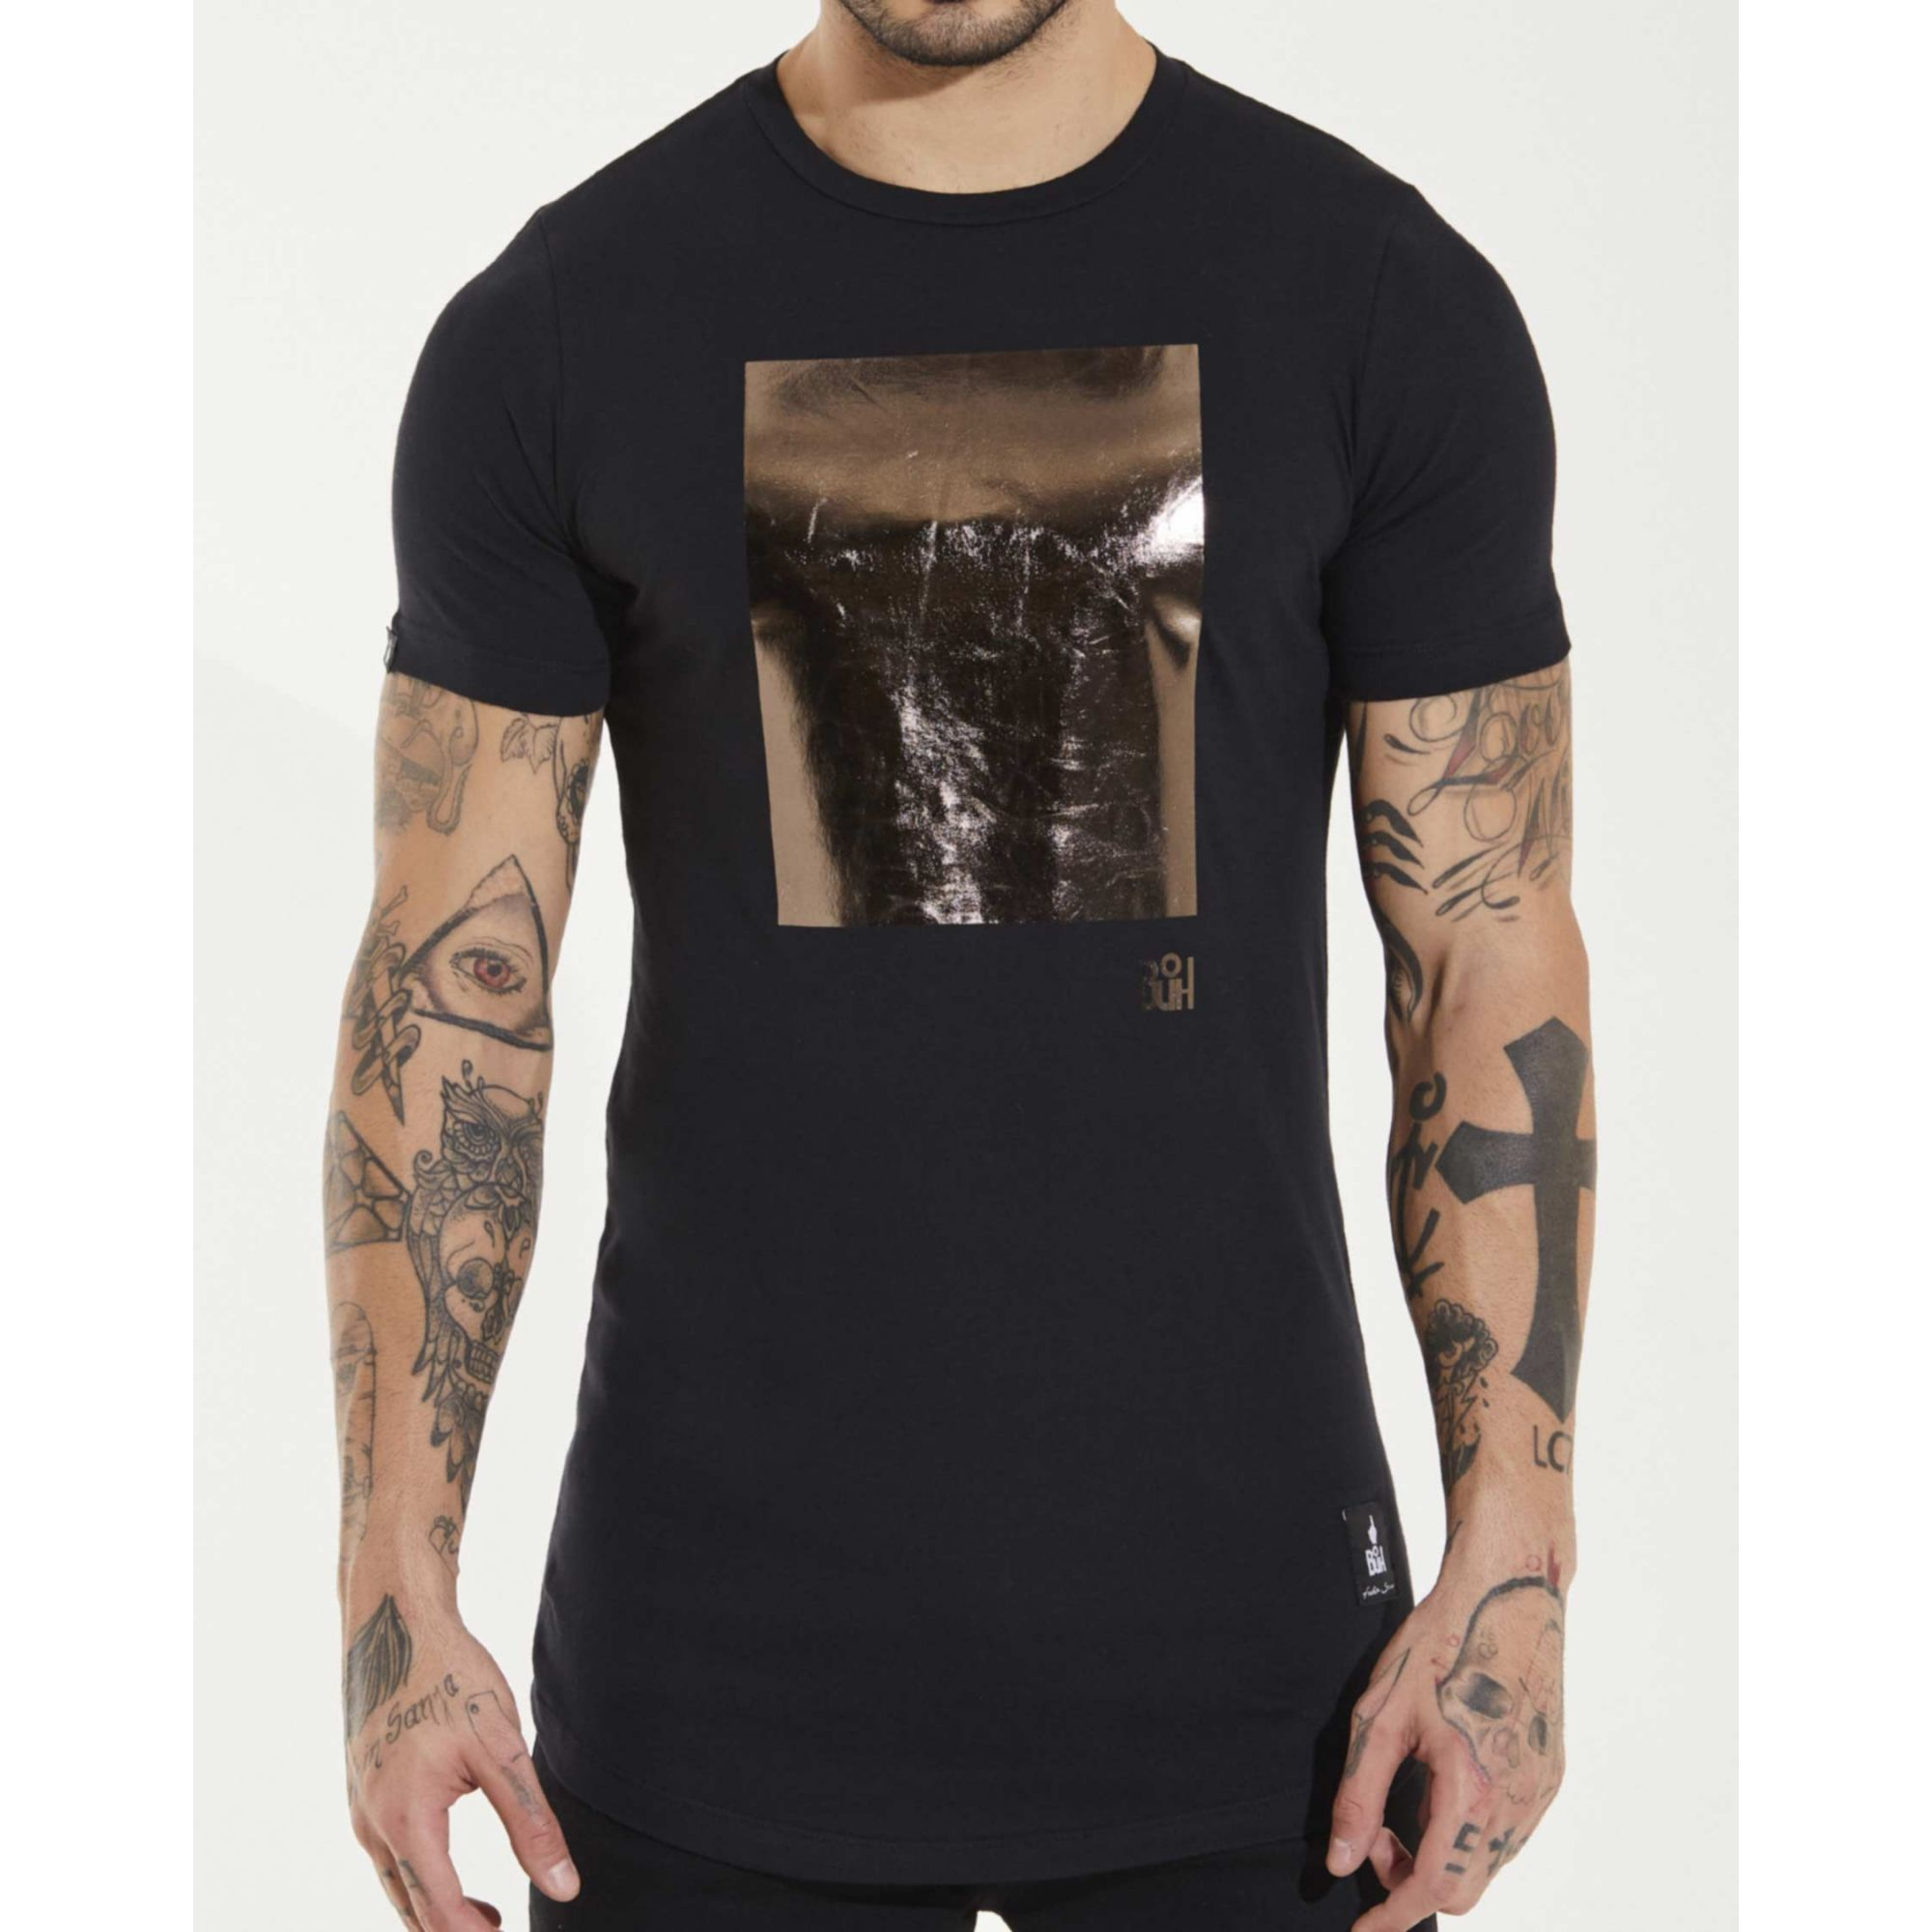 Camiseta Buh Square Foil Black & Gold